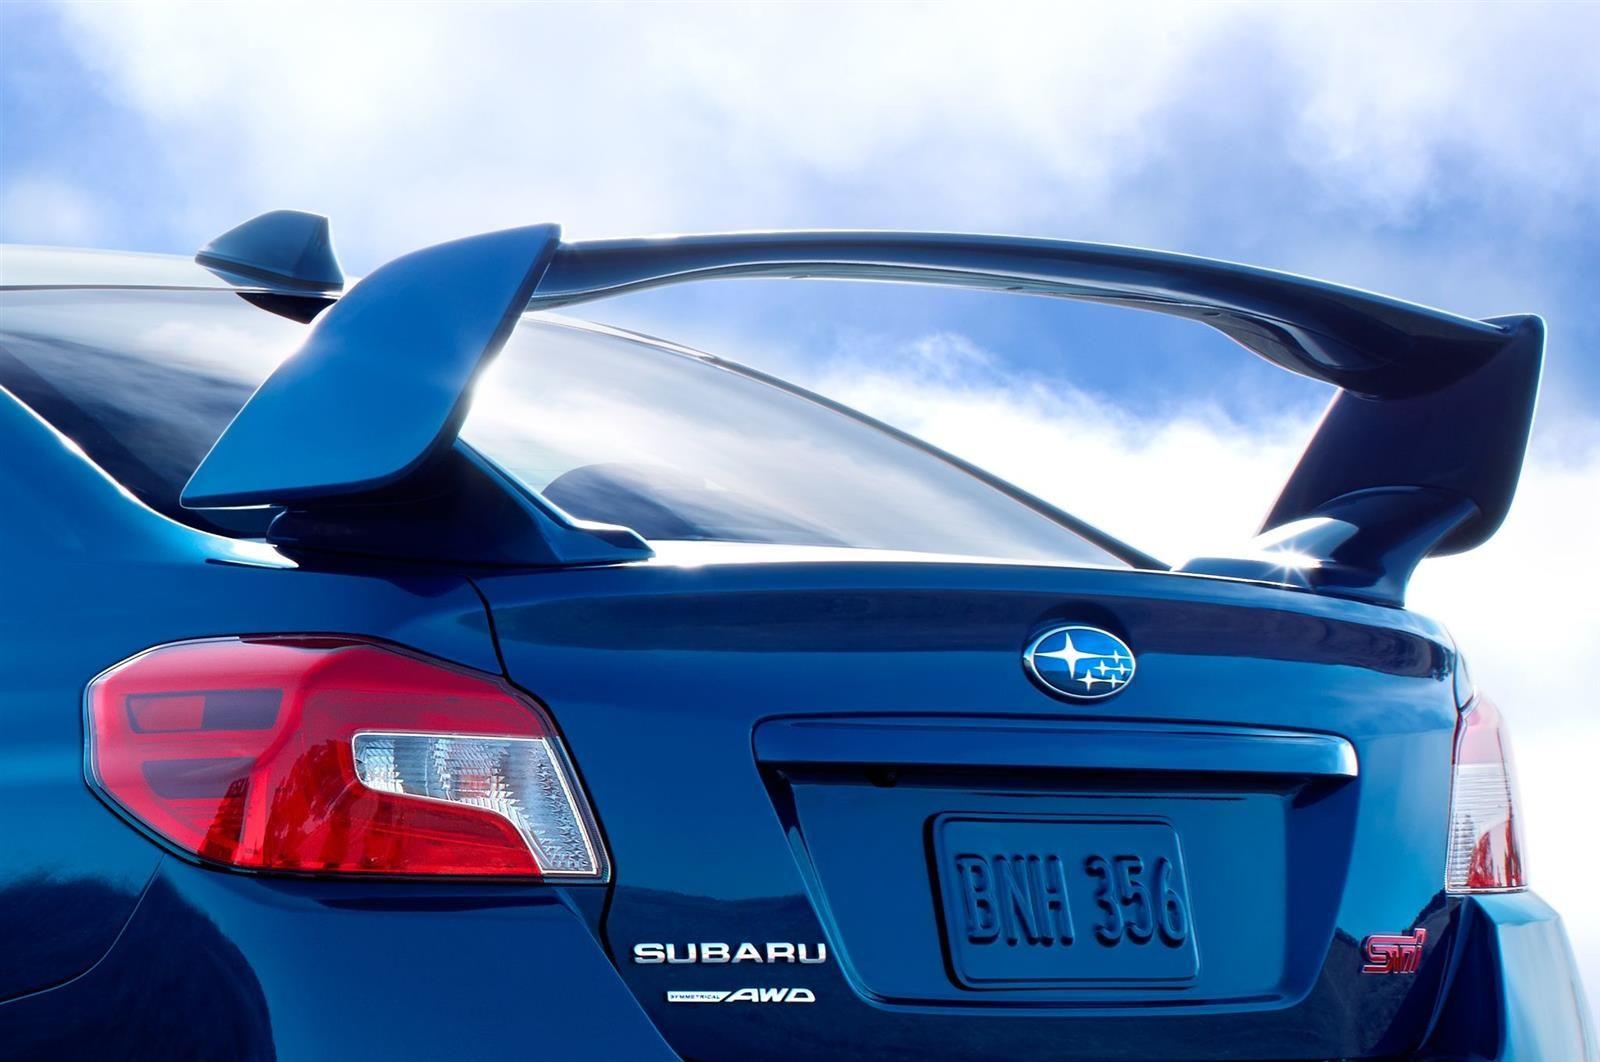 Subaru WRX STi - www.hartvoorautos.nl